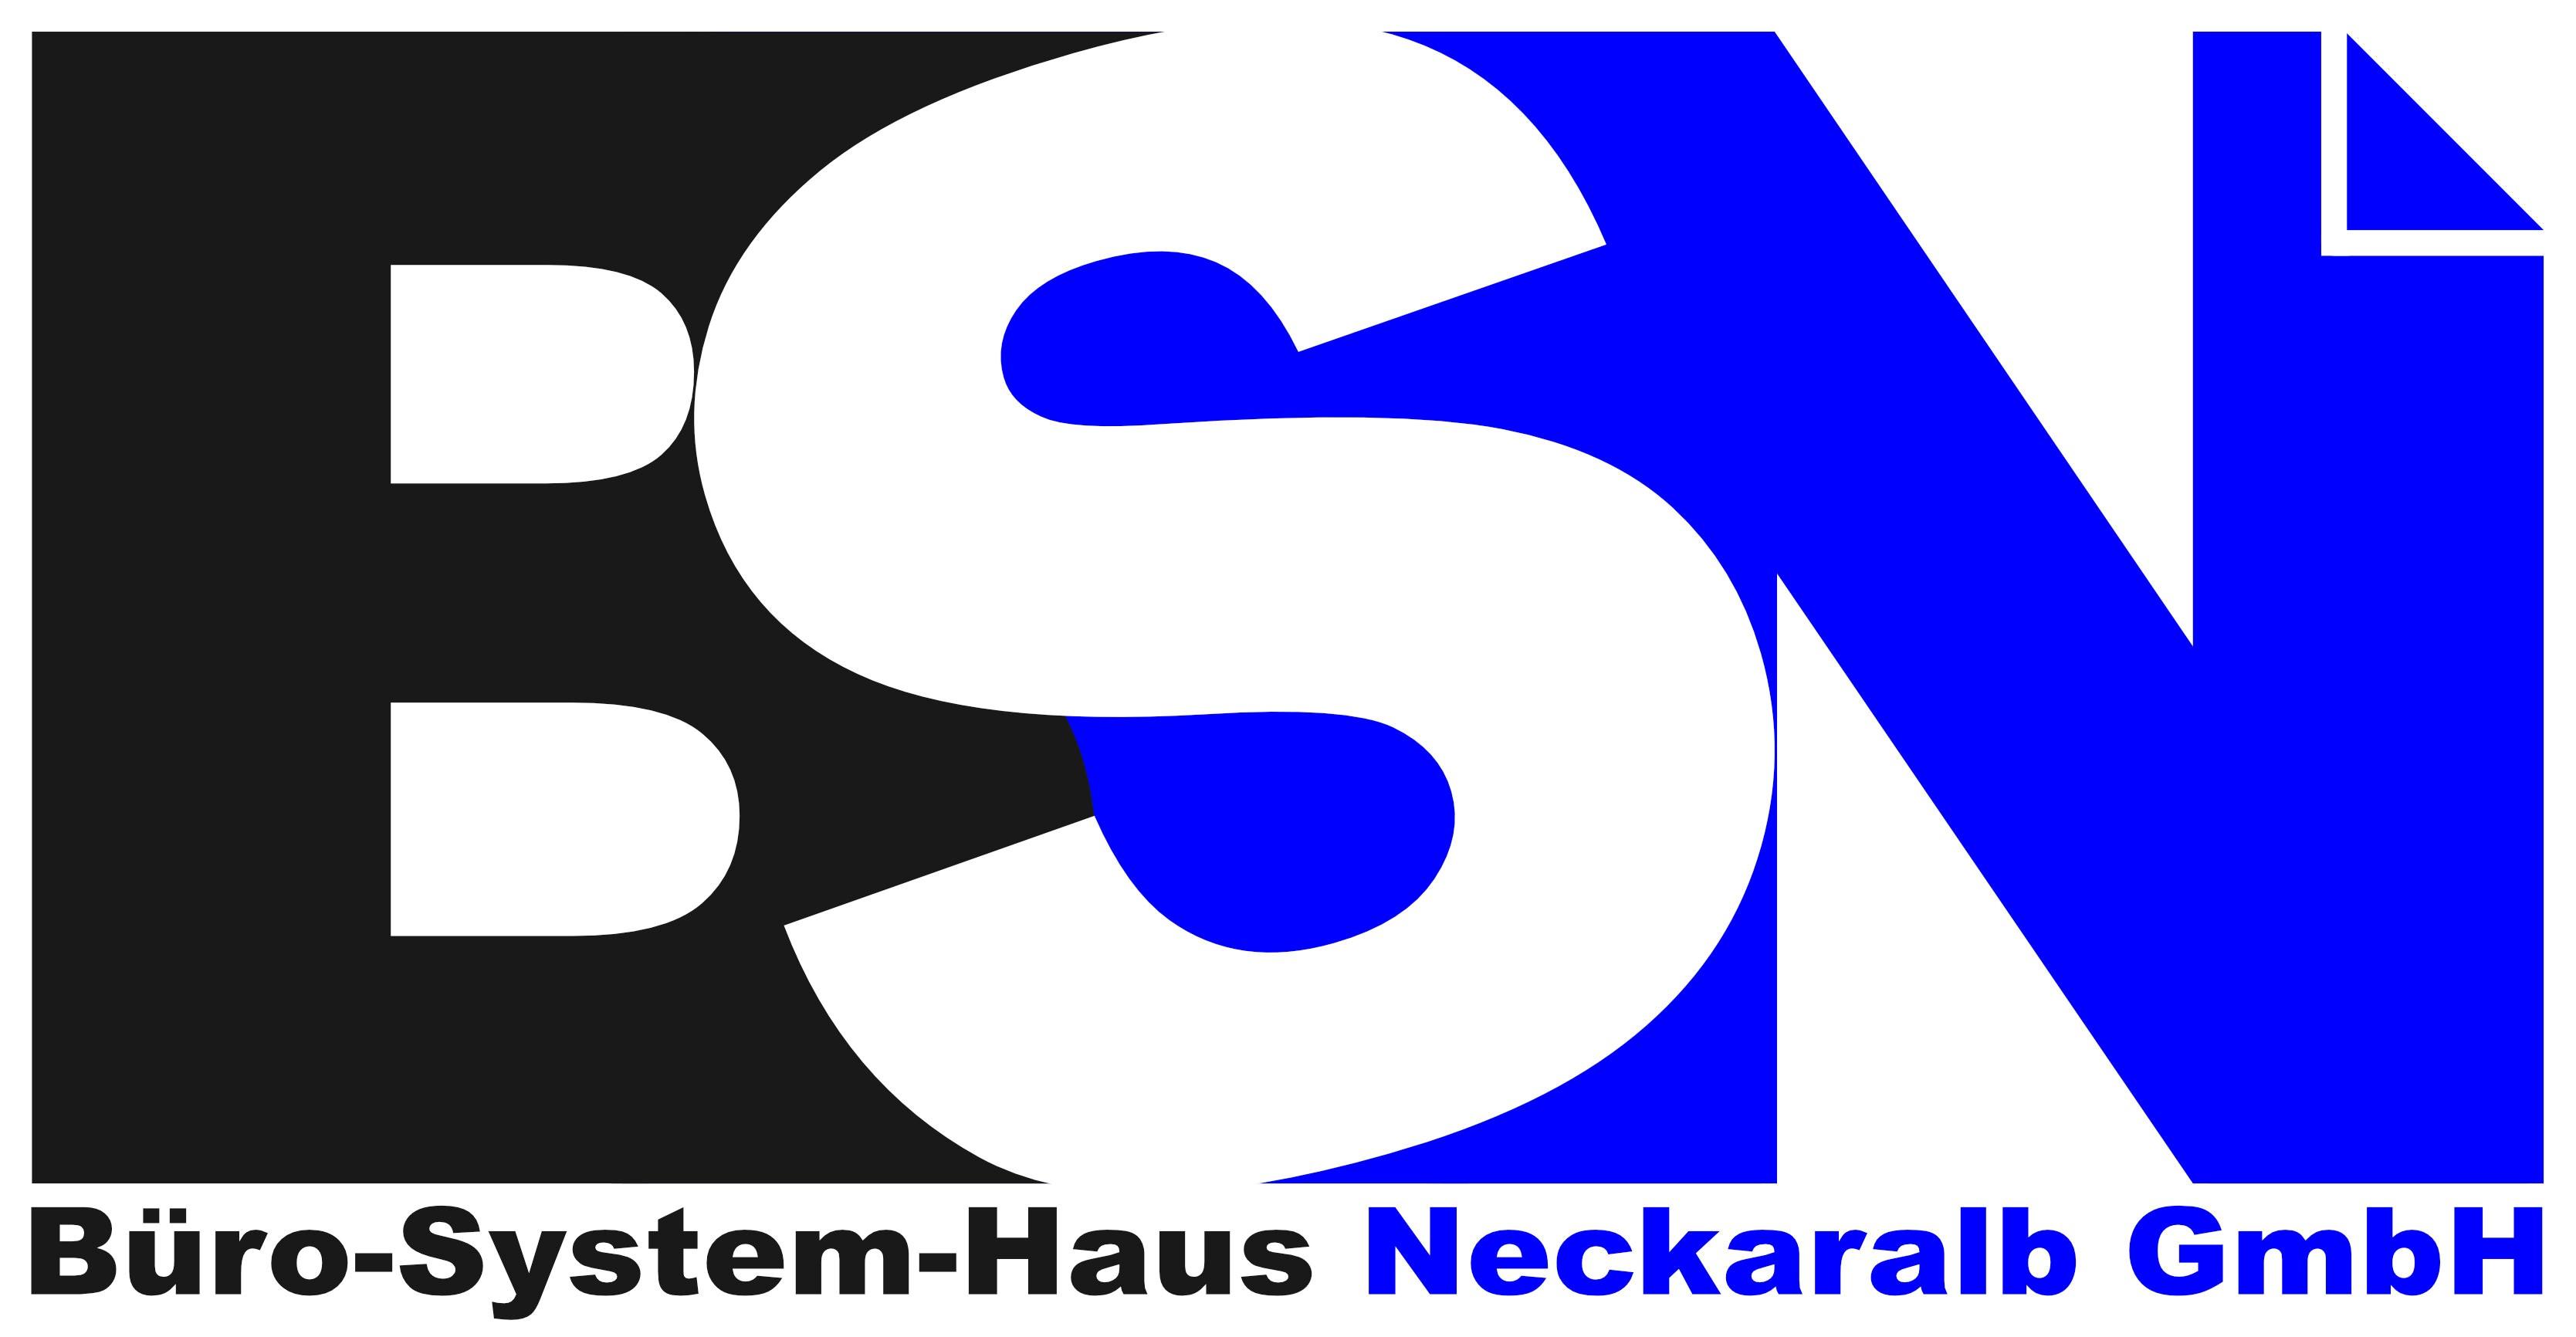 BSN GmbH Logo